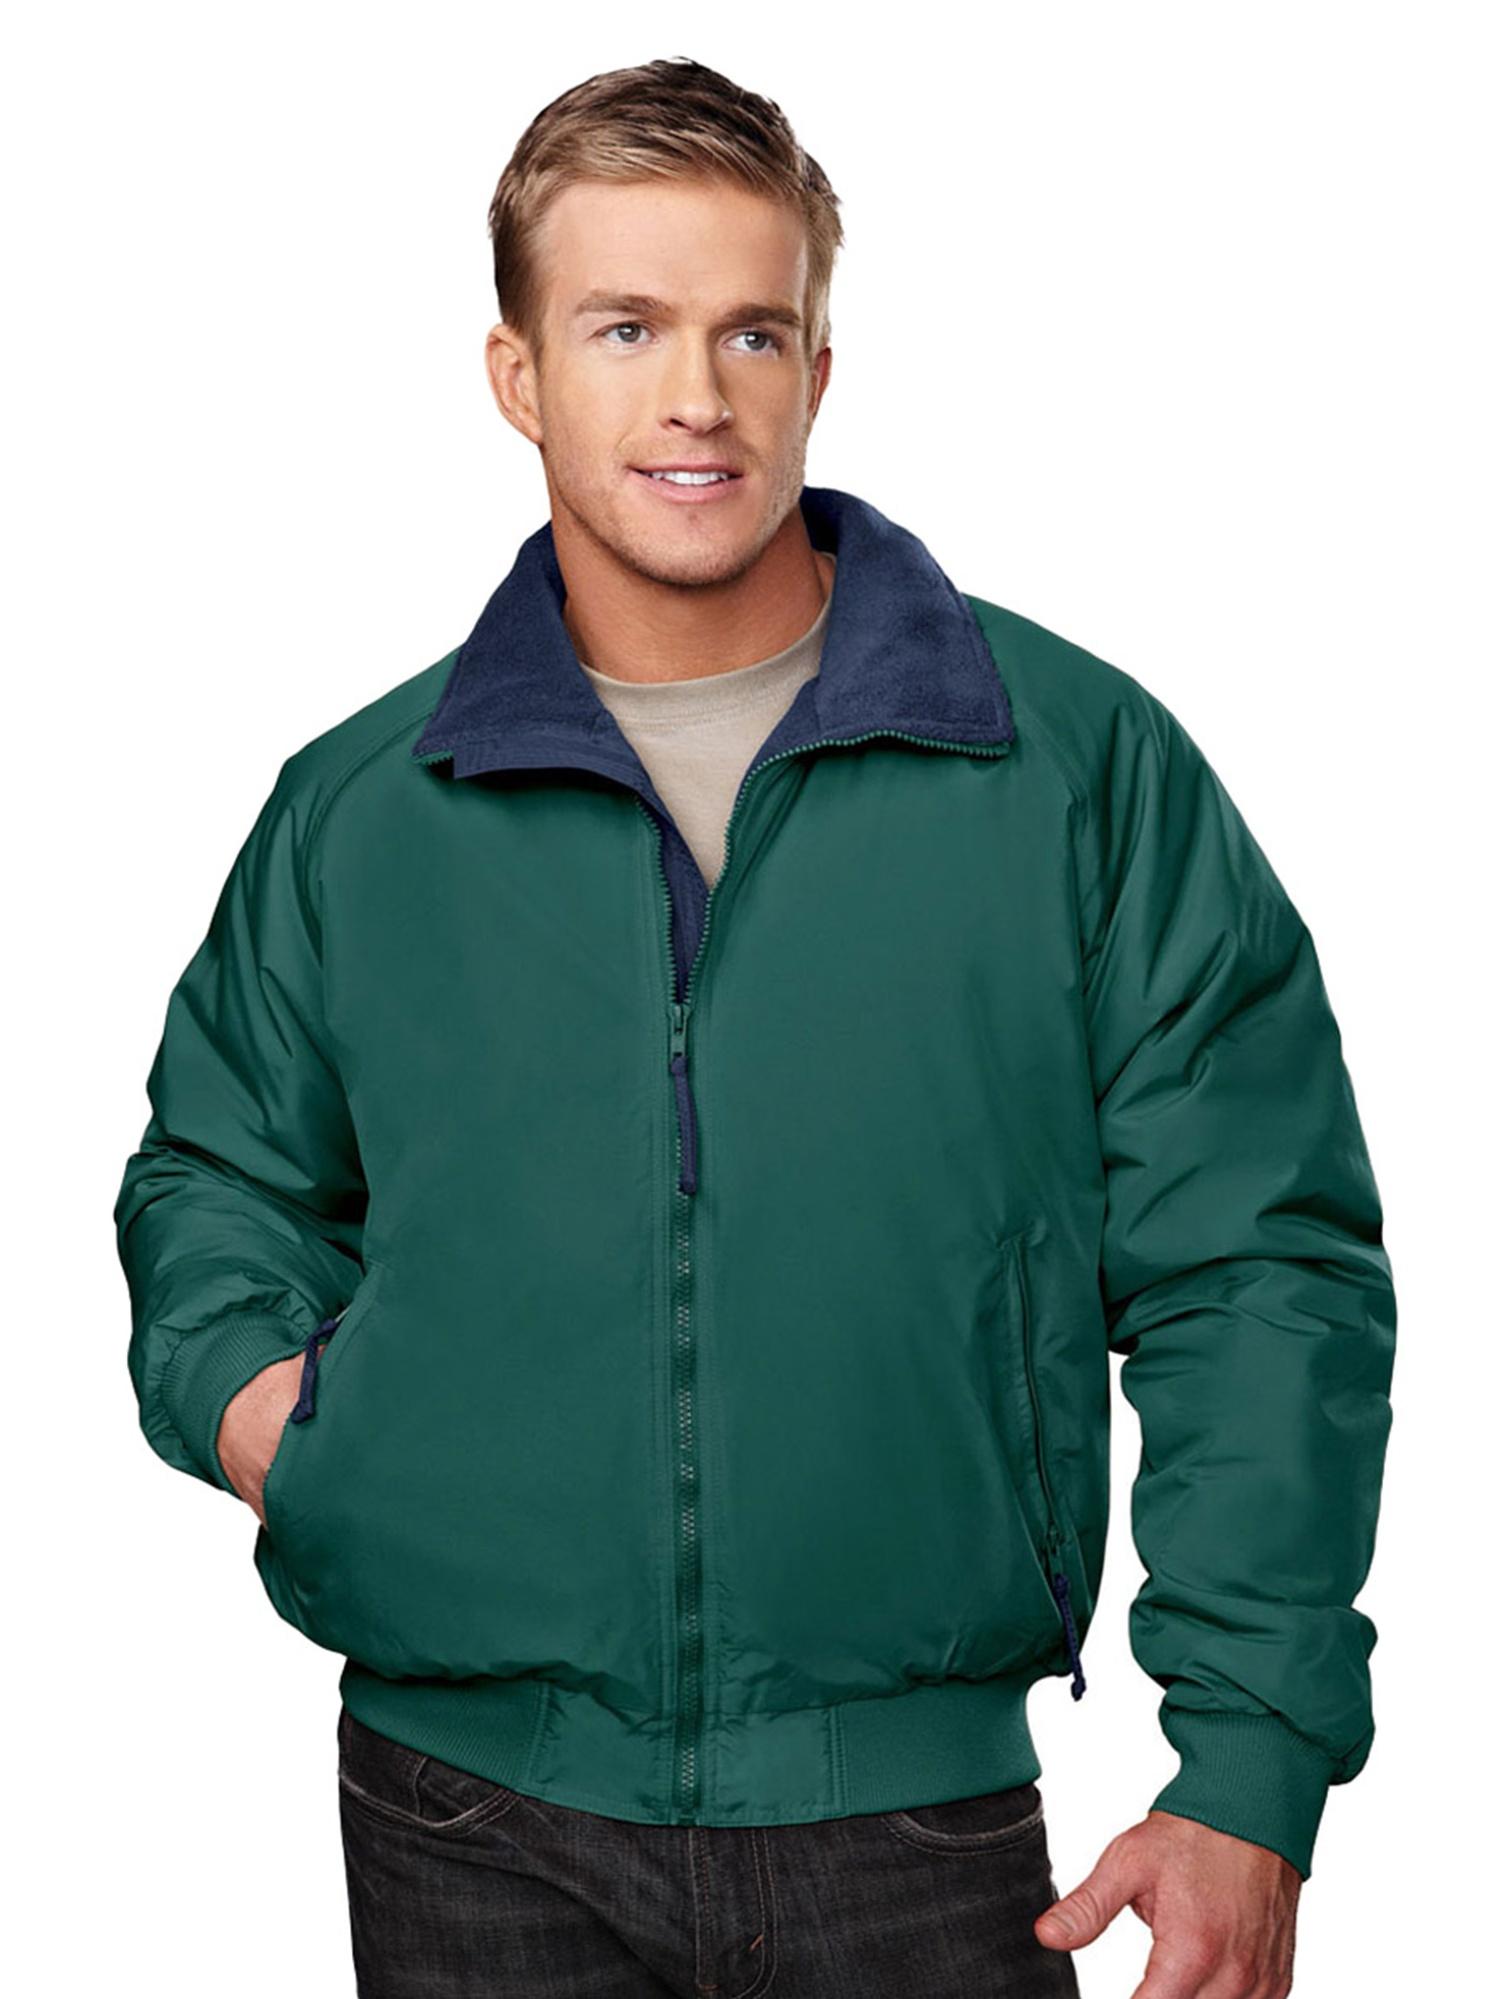 Tri-Mountain Men's Big And Tall Three Season Jacket